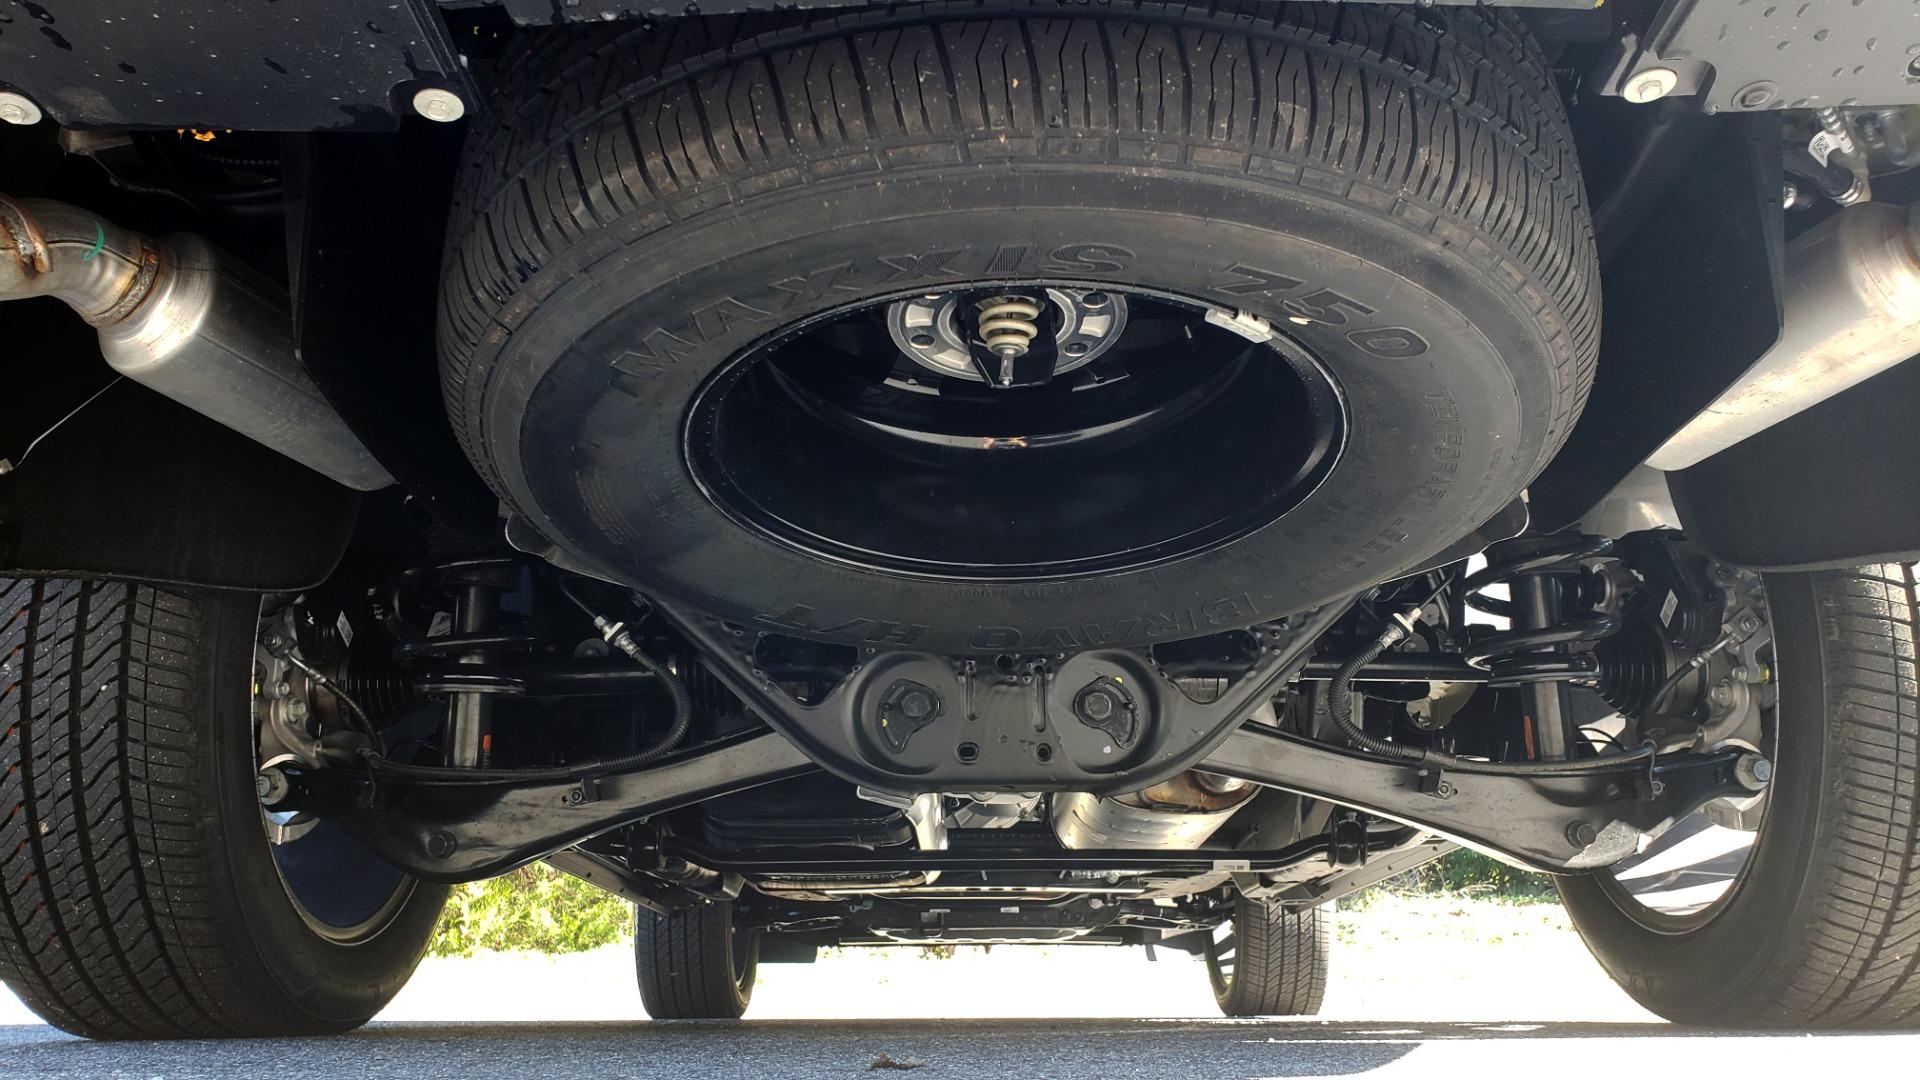 Used 2021 GMC YUKON DENALI PREMIUM 4WD / NAV / ADVANCED TECH / ENTERTAINMENT for sale Sold at Formula Imports in Charlotte NC 28227 36